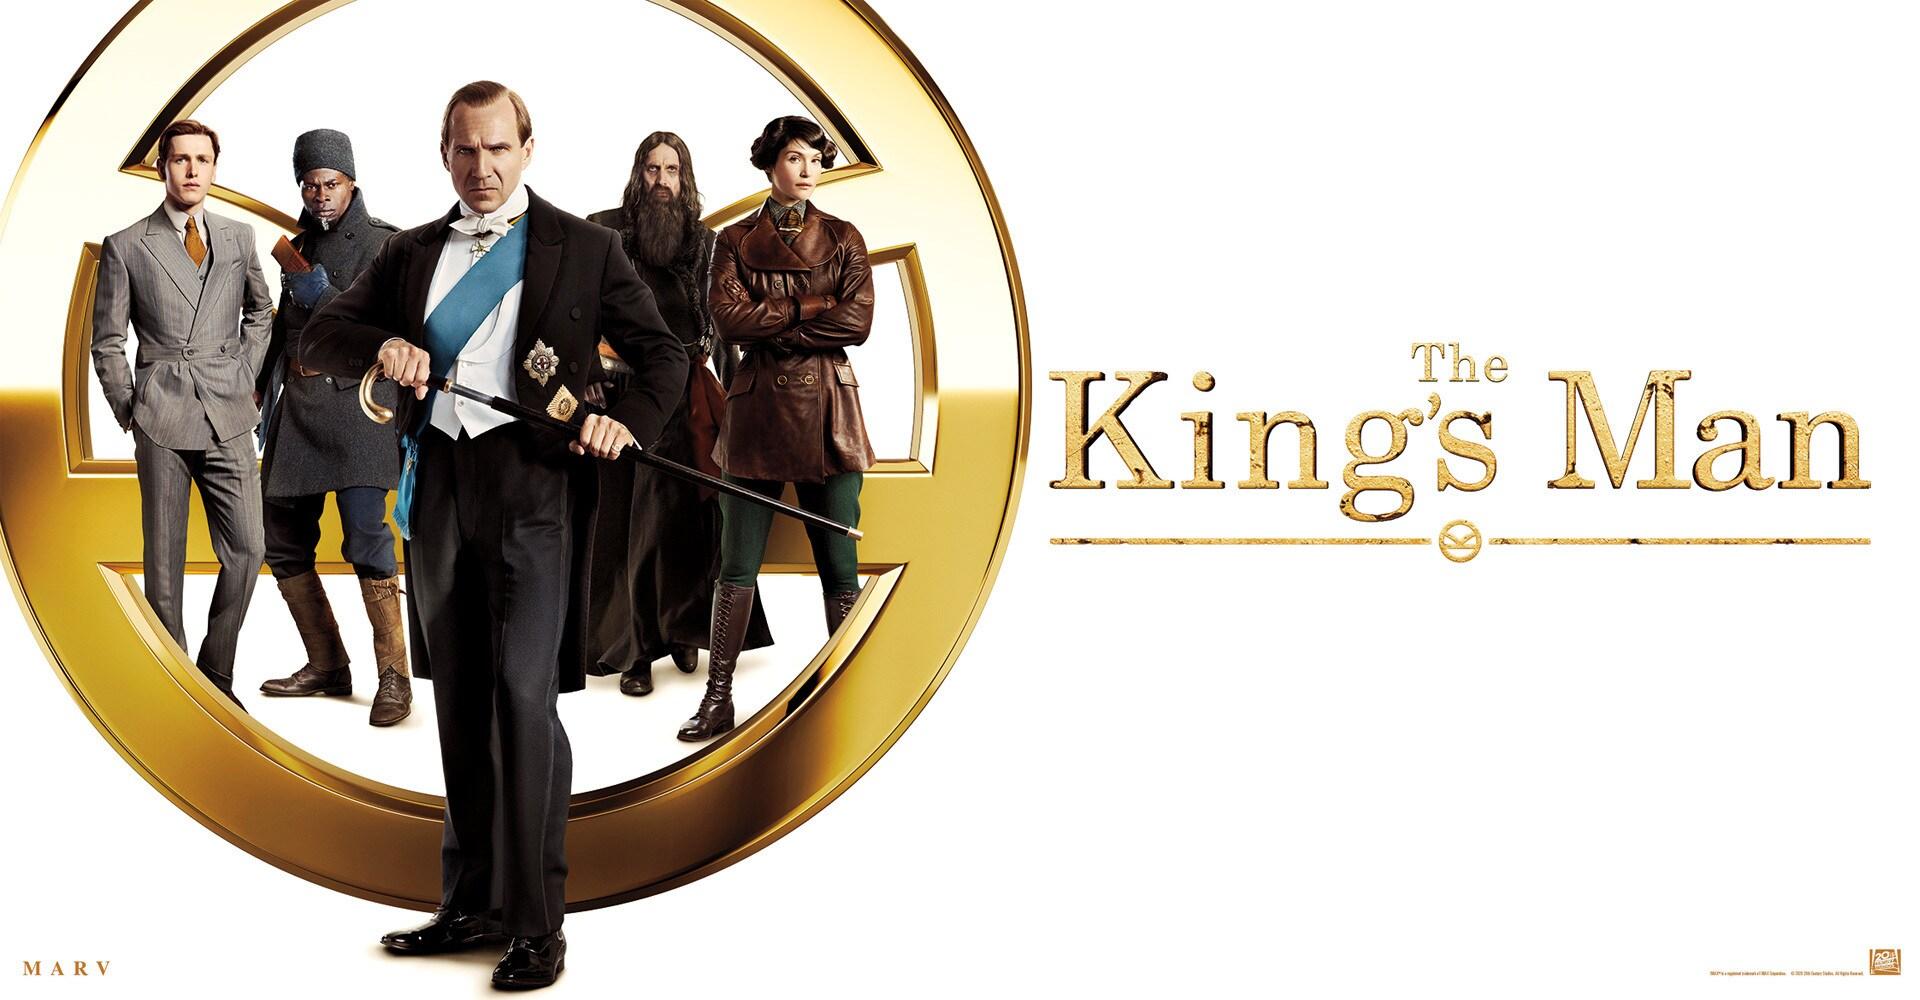 The King's Man SG - Banner Hero Object